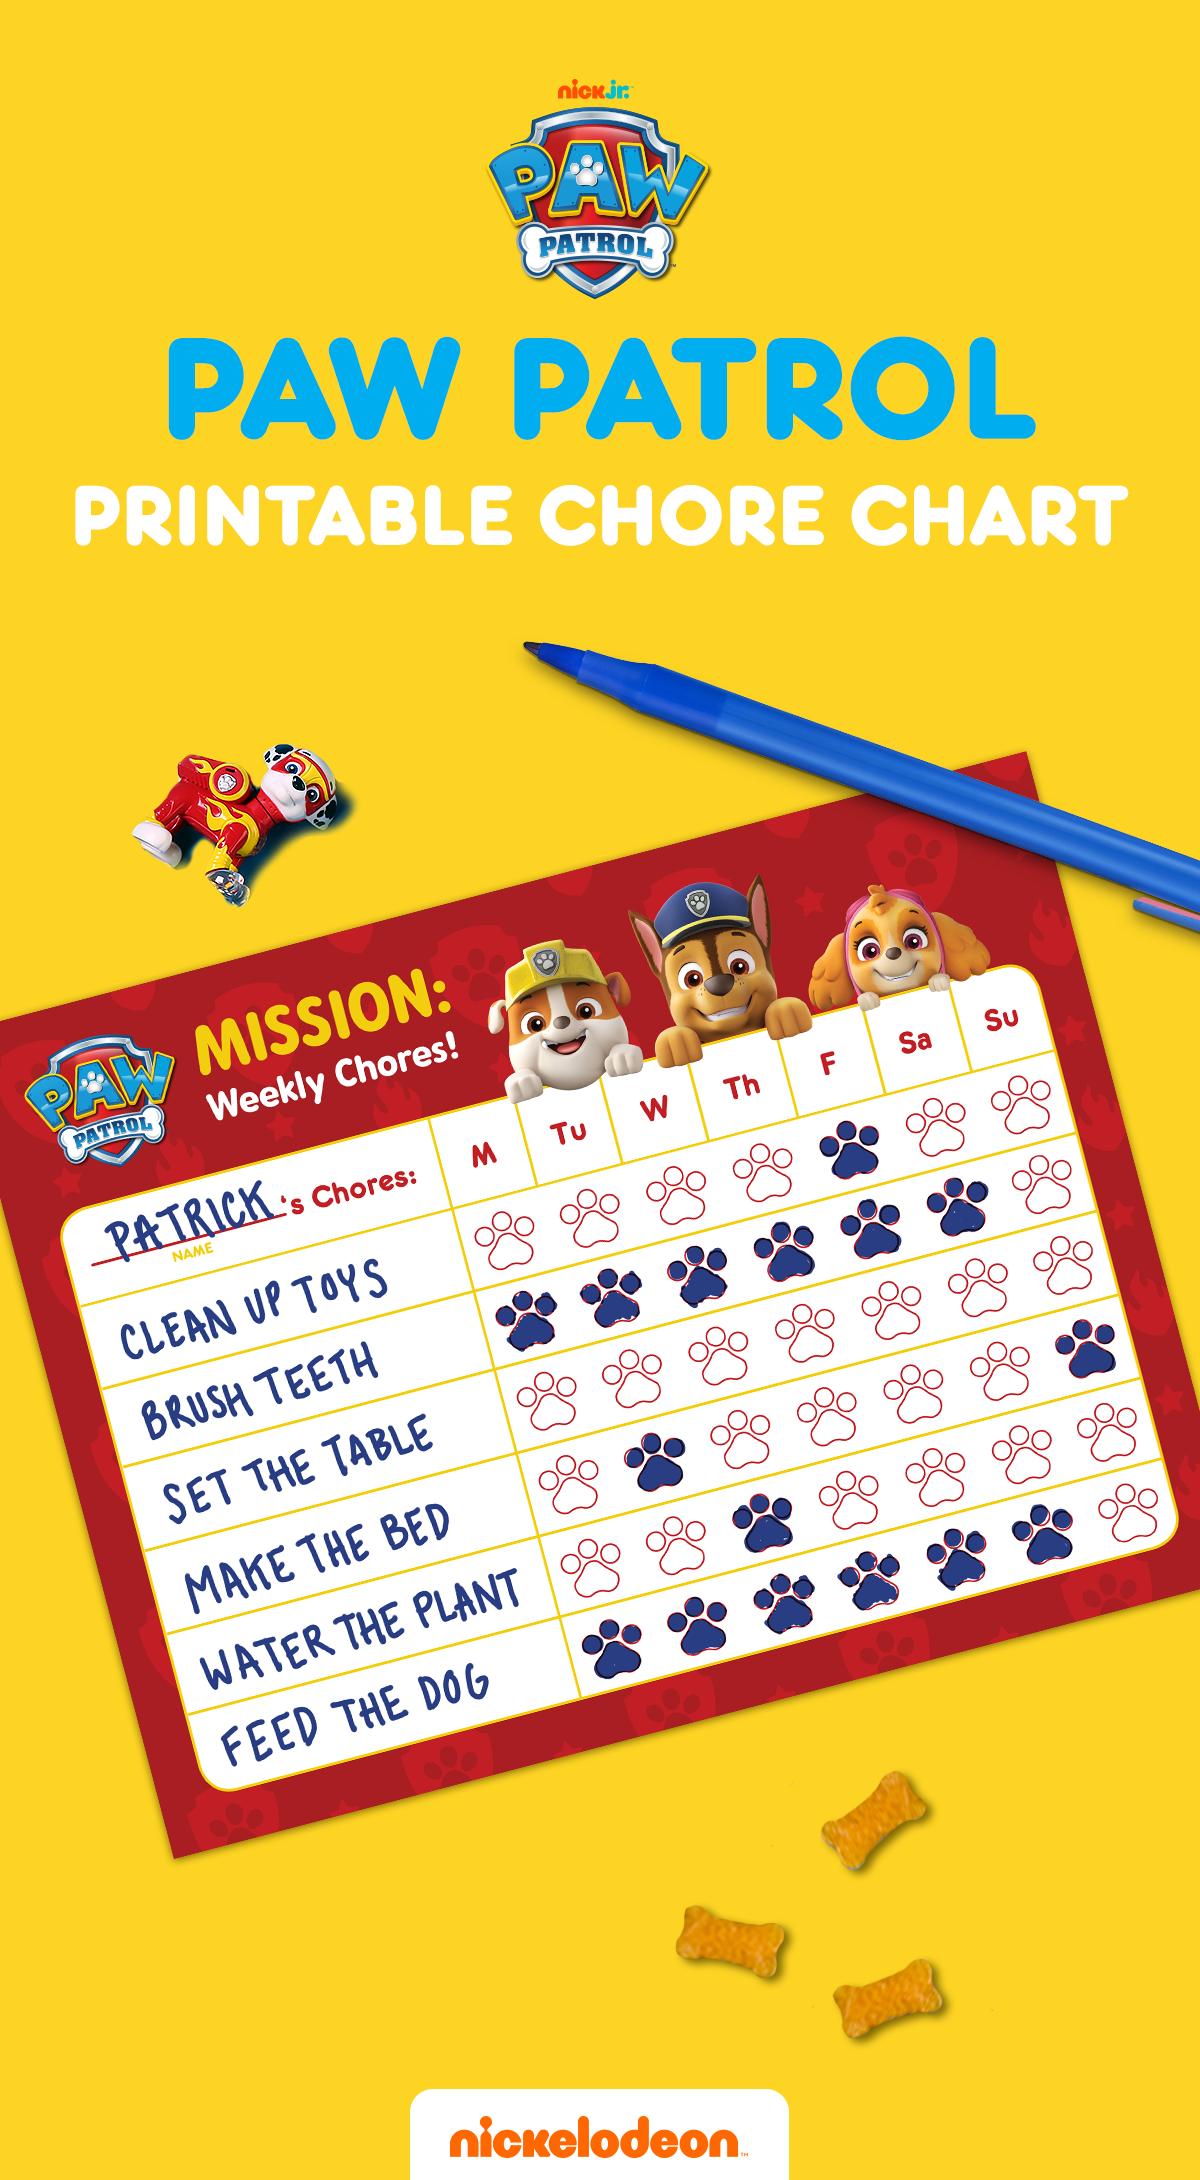 Paw Patrol Chore Chart In